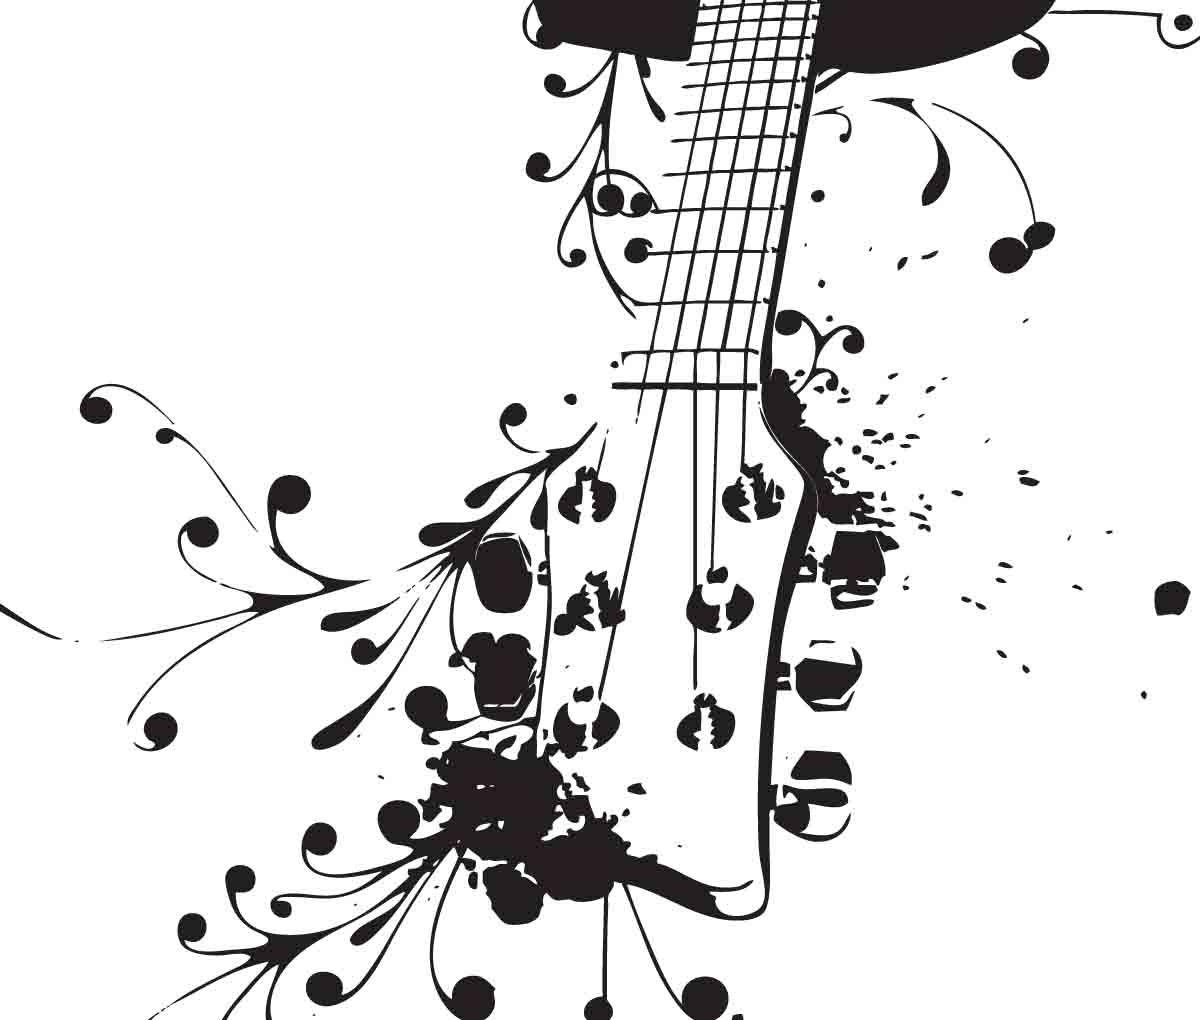 acoustic guitar uber decals wall decal vinyl decor art